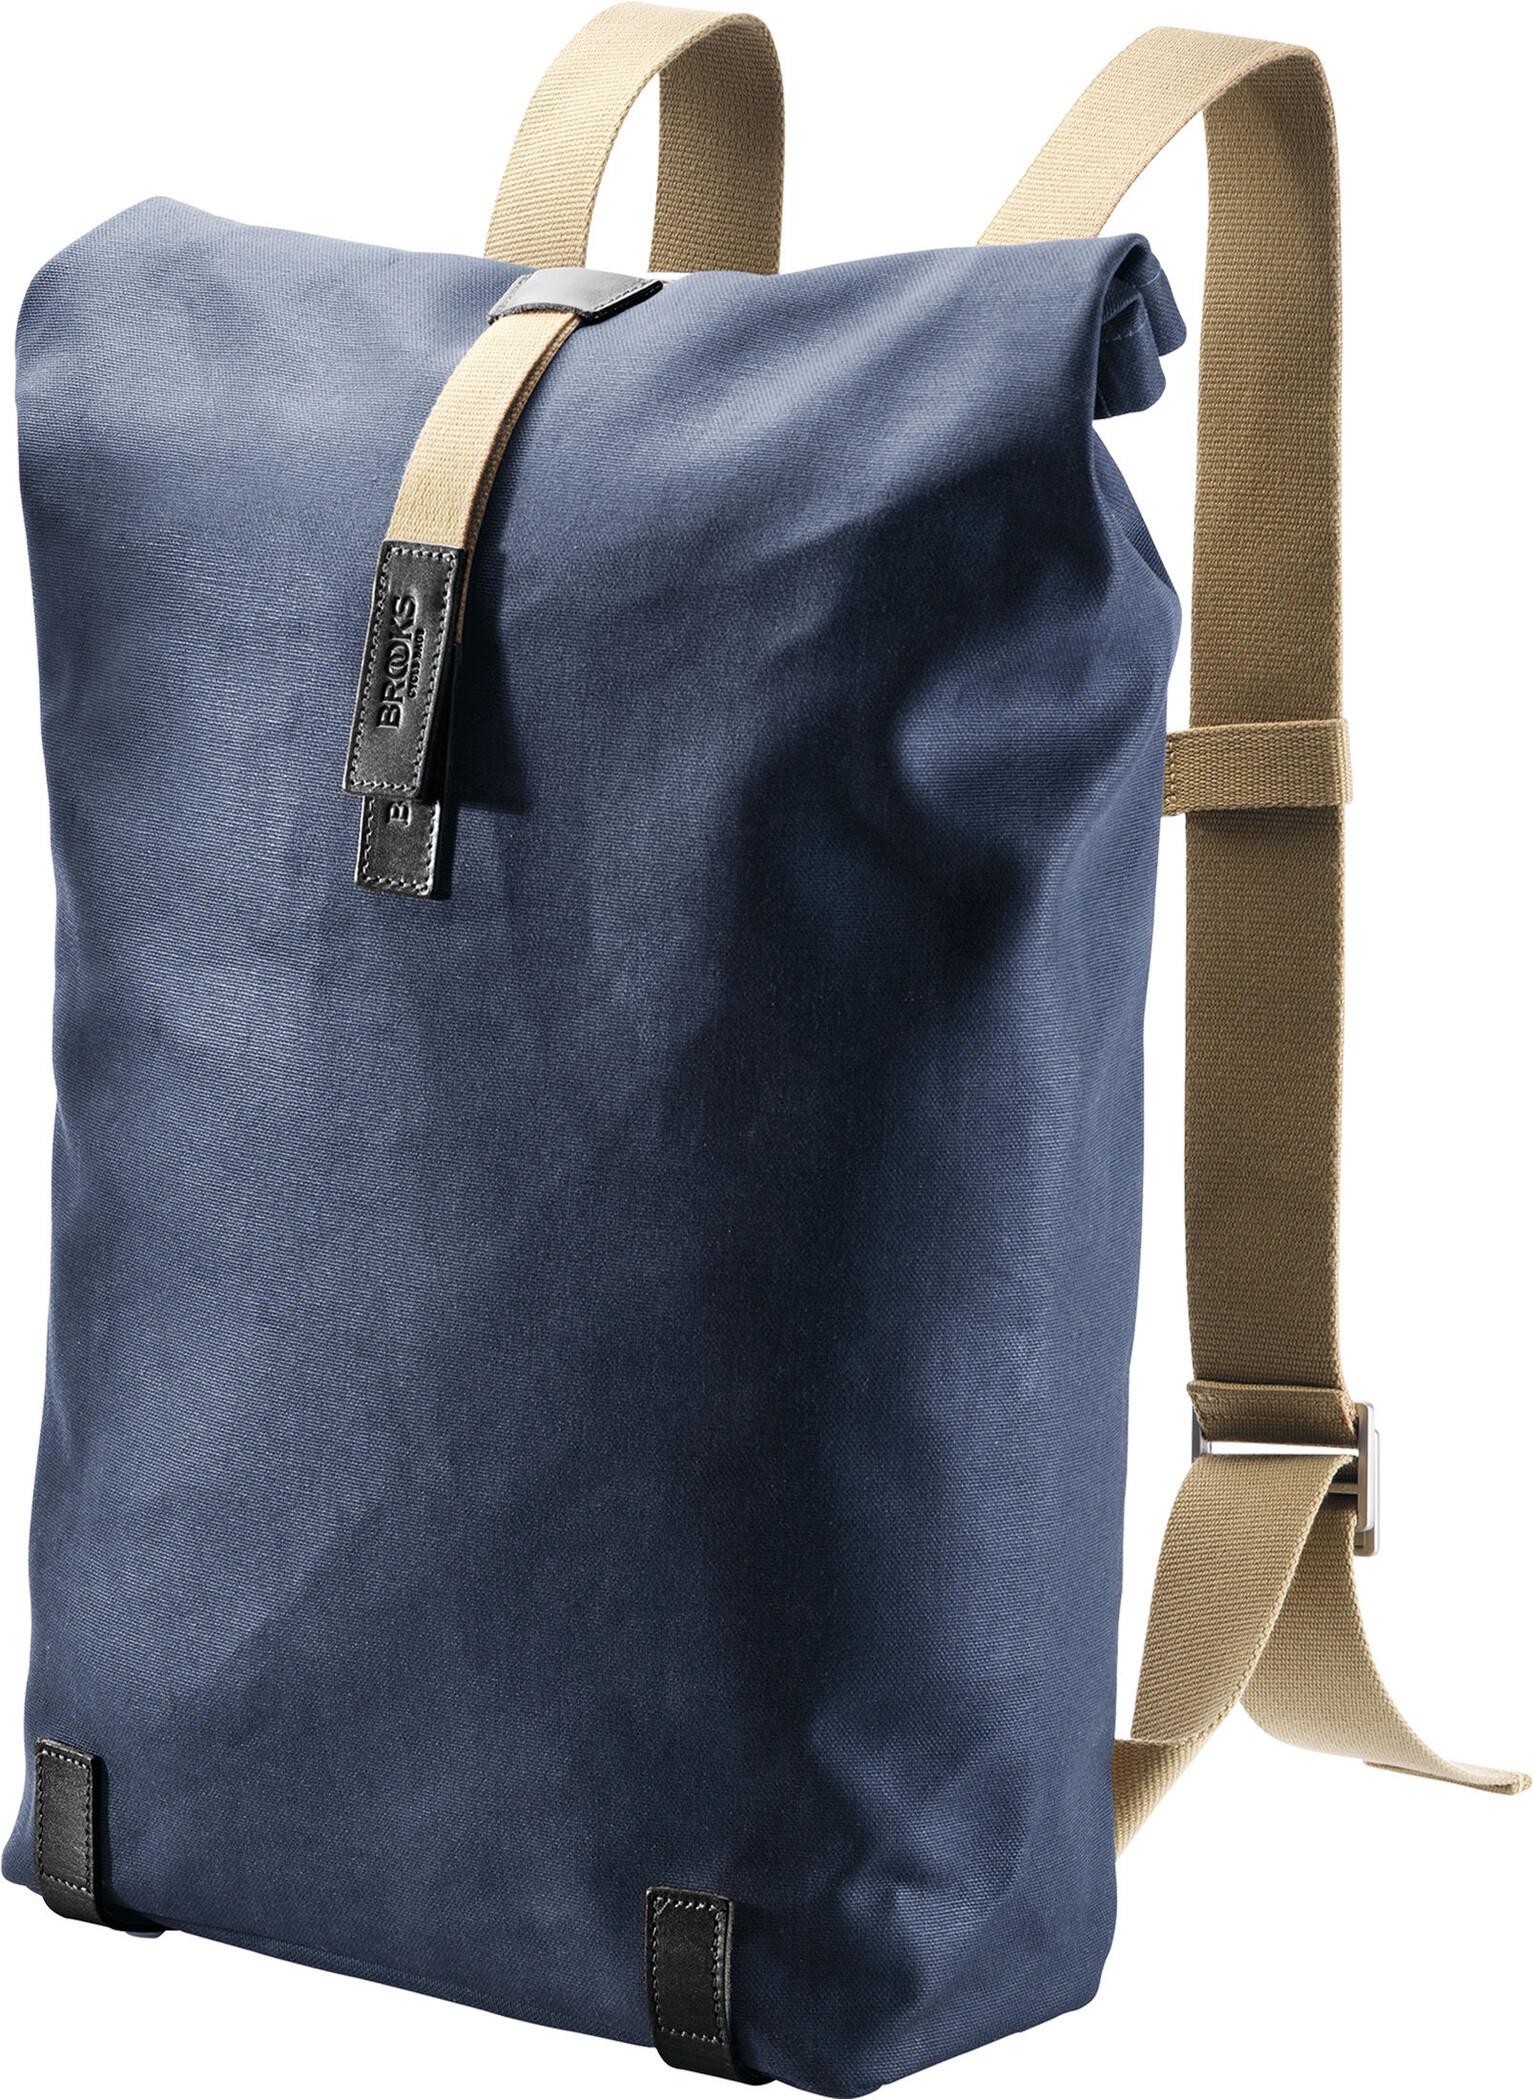 Brooks Pickwick Canvas Rygsæk 26L, dark blue/black (2019) | Travel bags